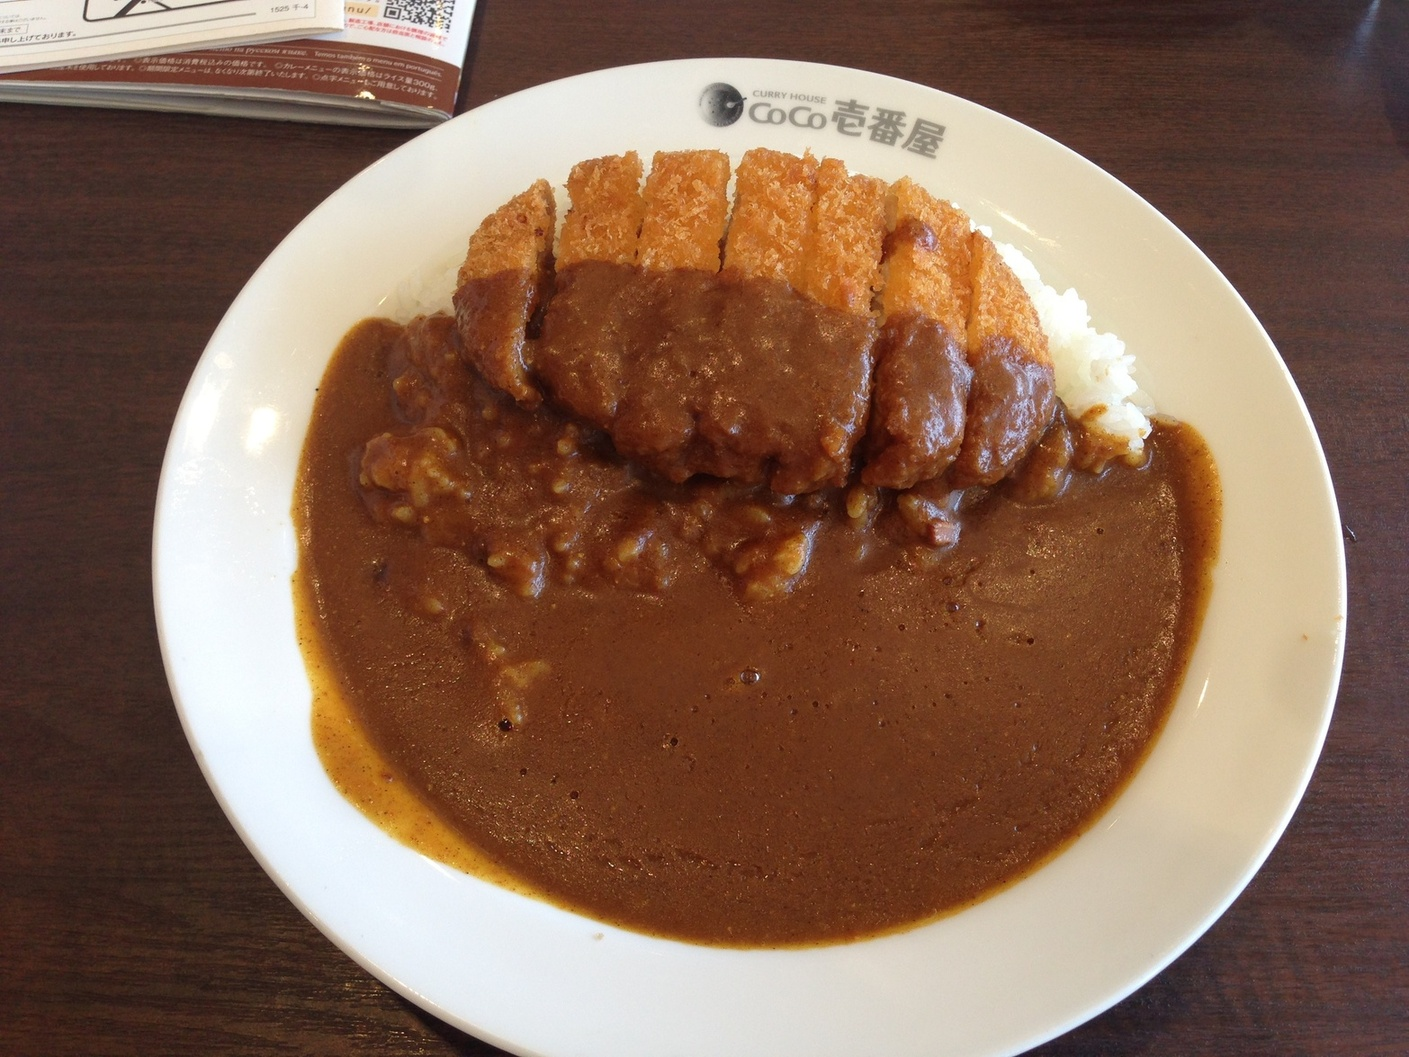 CoCo壱番屋 土浦北インター店